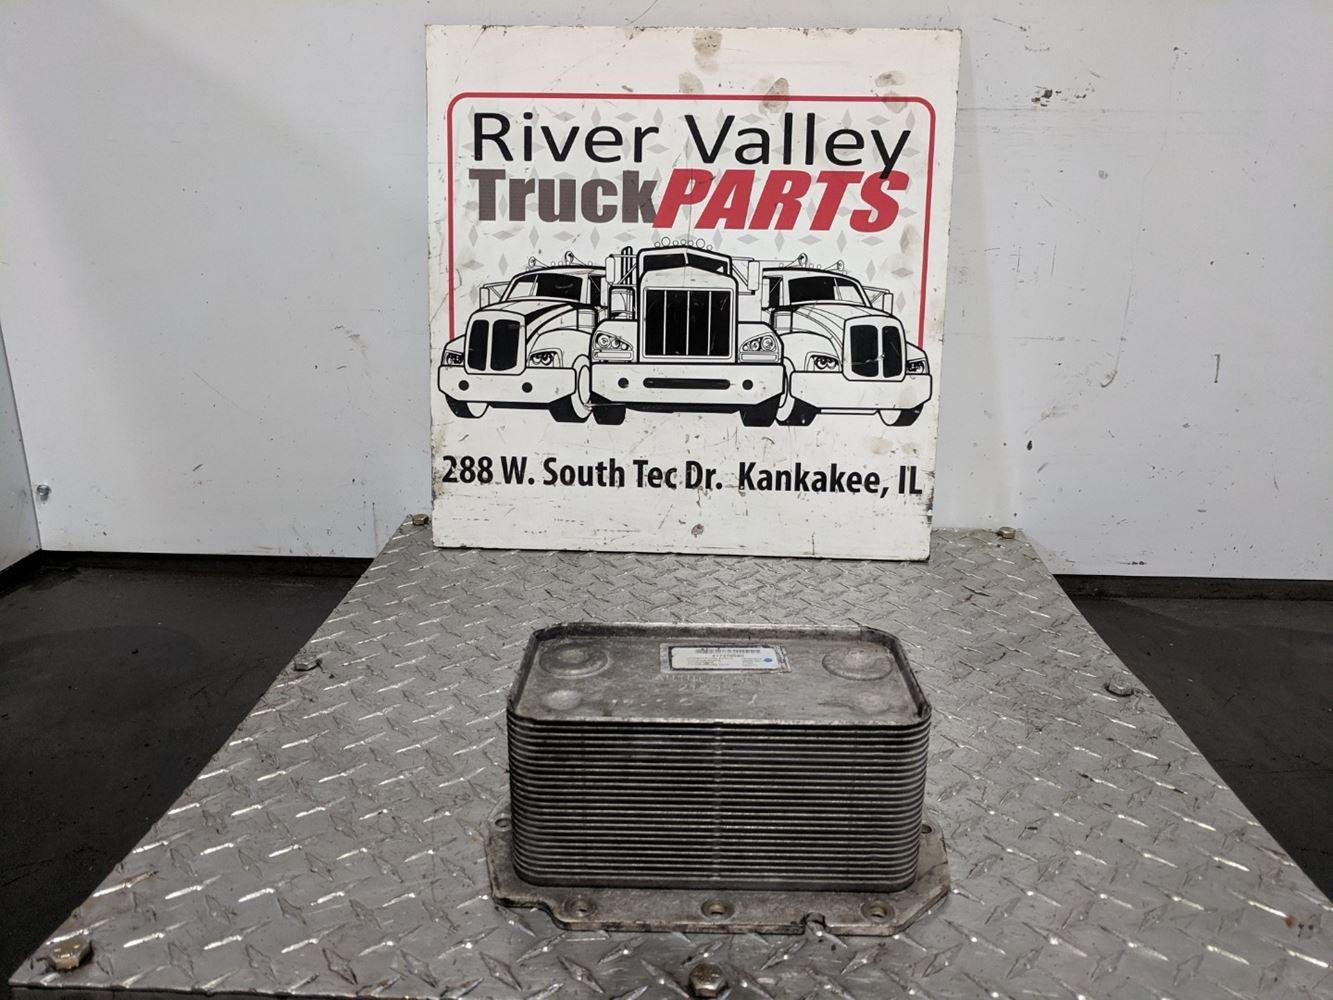 Used Truck Parts - Freightliner | International | Peterbilt | Volvo